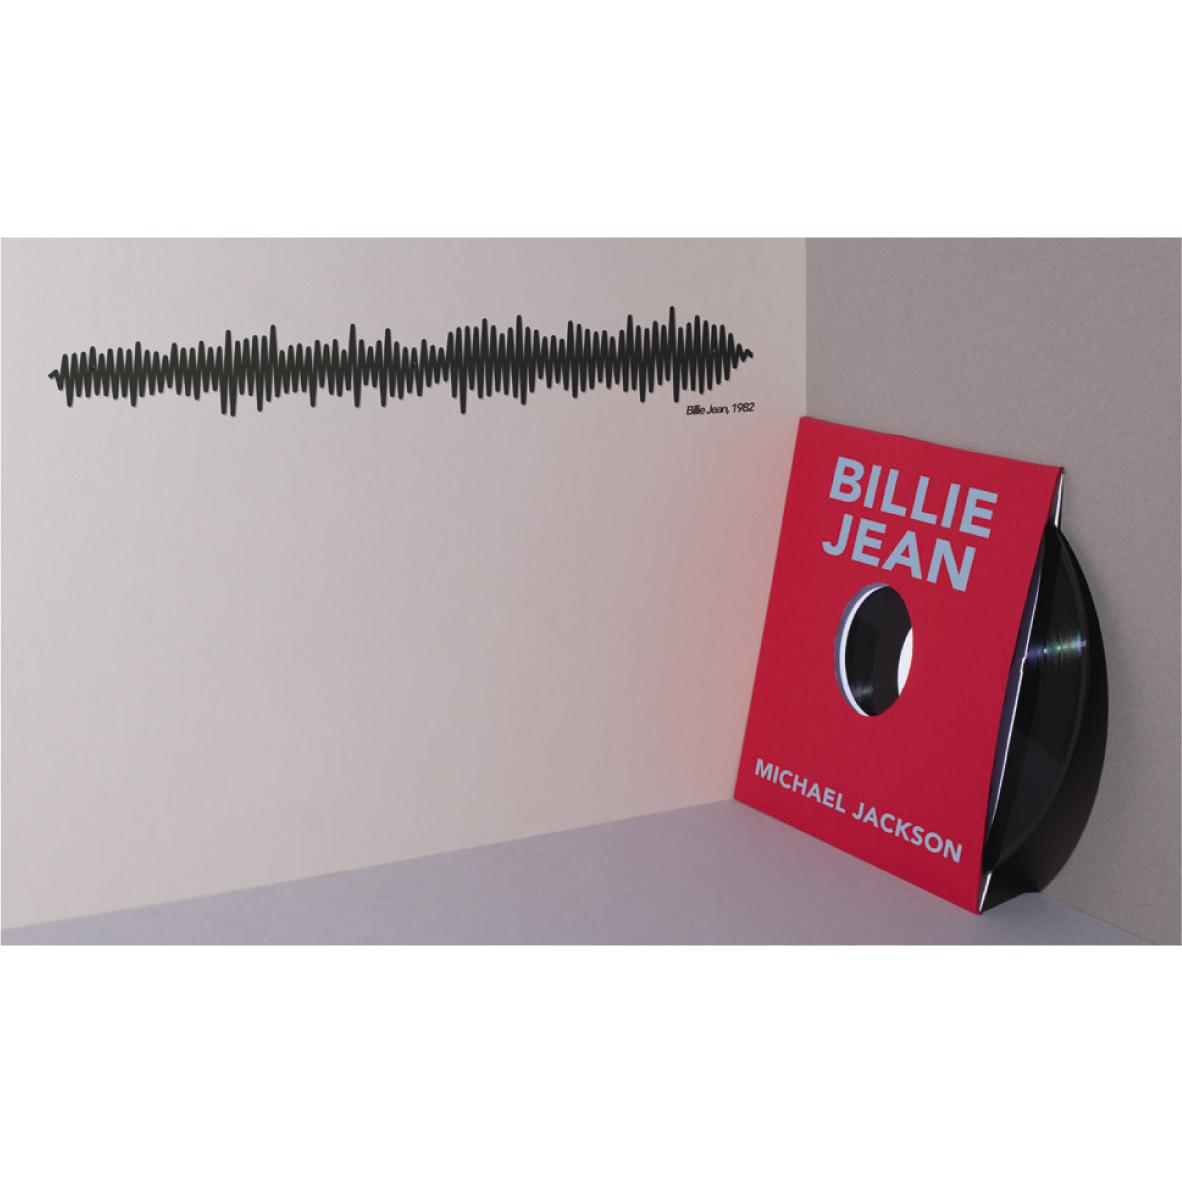 theLine® Music _ BILLIE JEAN, MICHAEL JACKSON